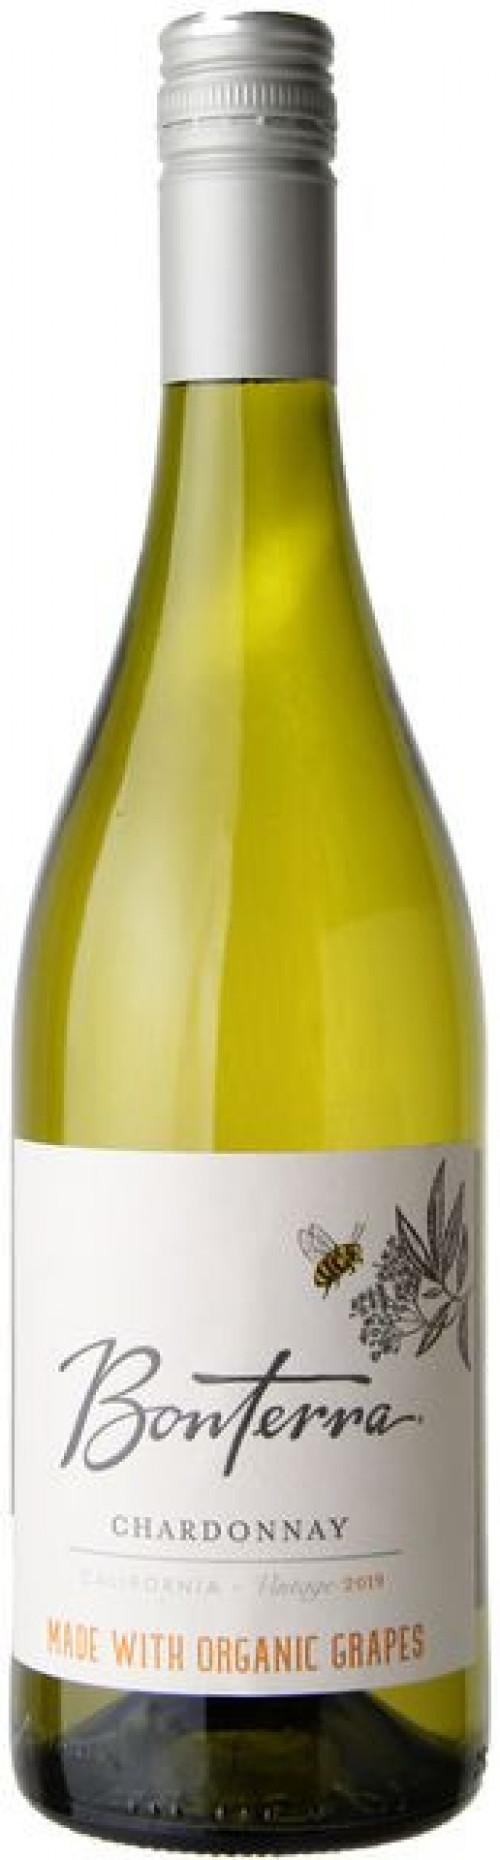 Bonterra Chardonnay 750ml